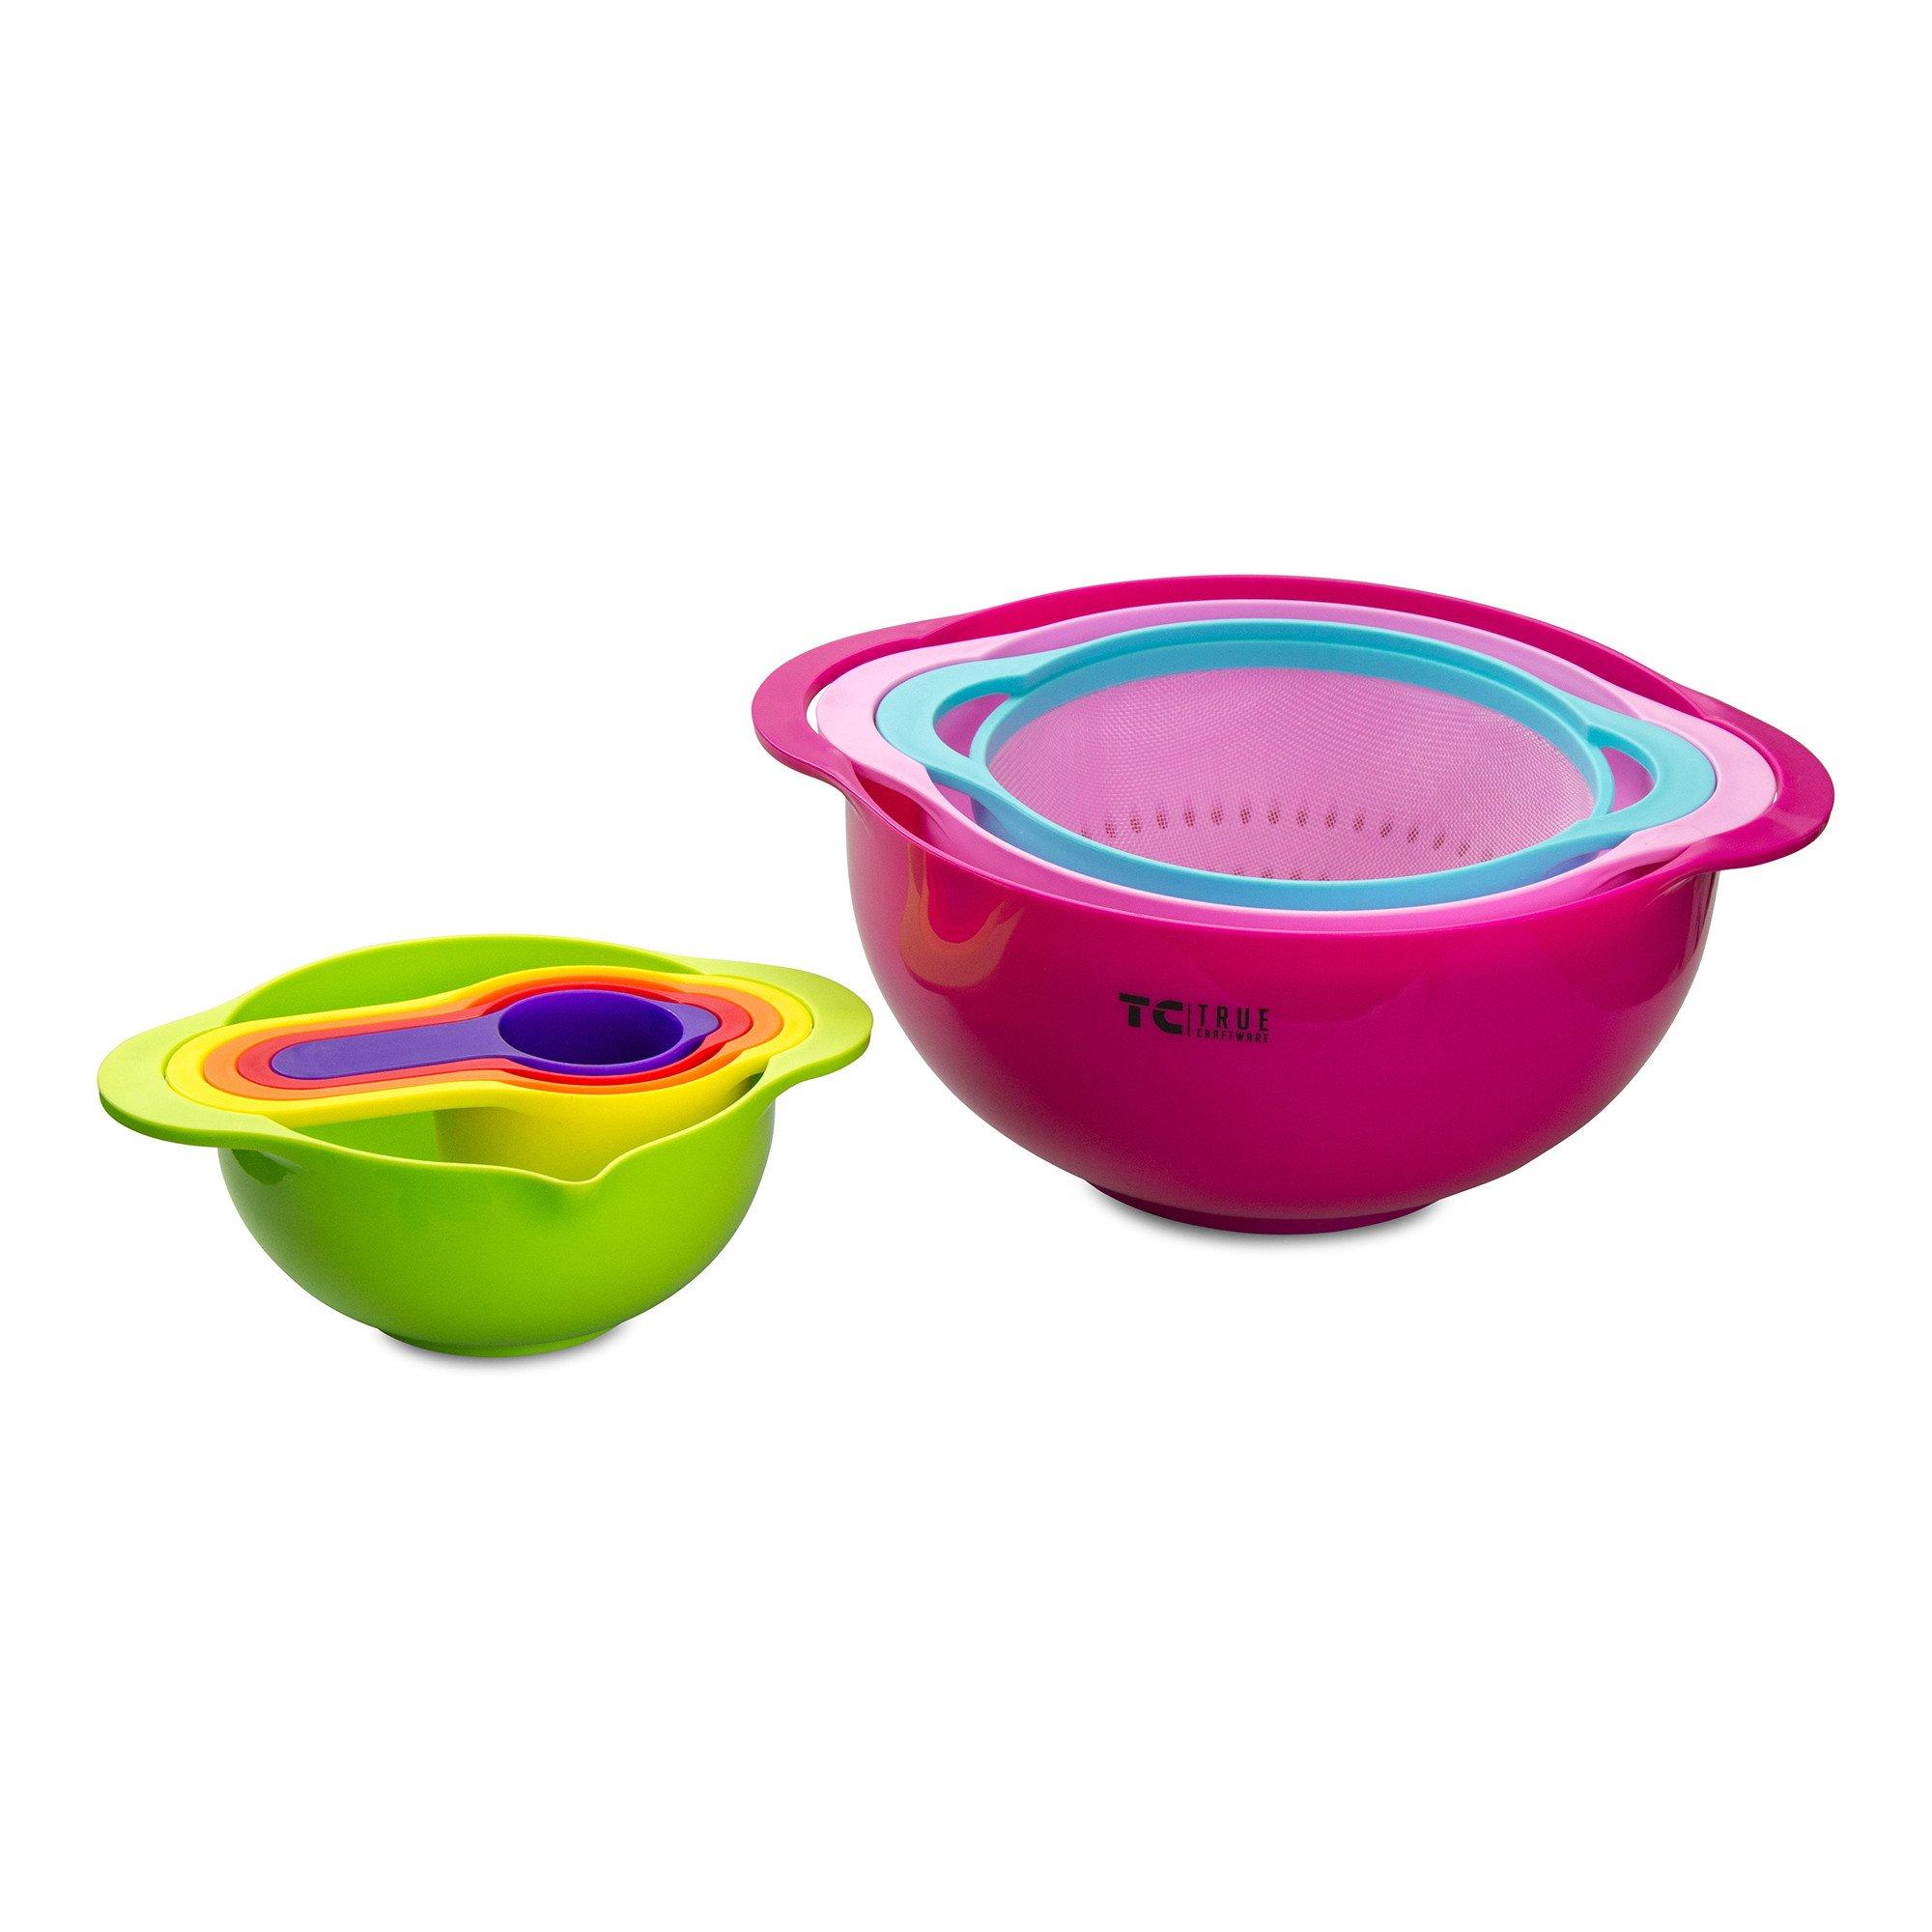 2000x2000 8 Piece True Craftware Mixing Bowl Set